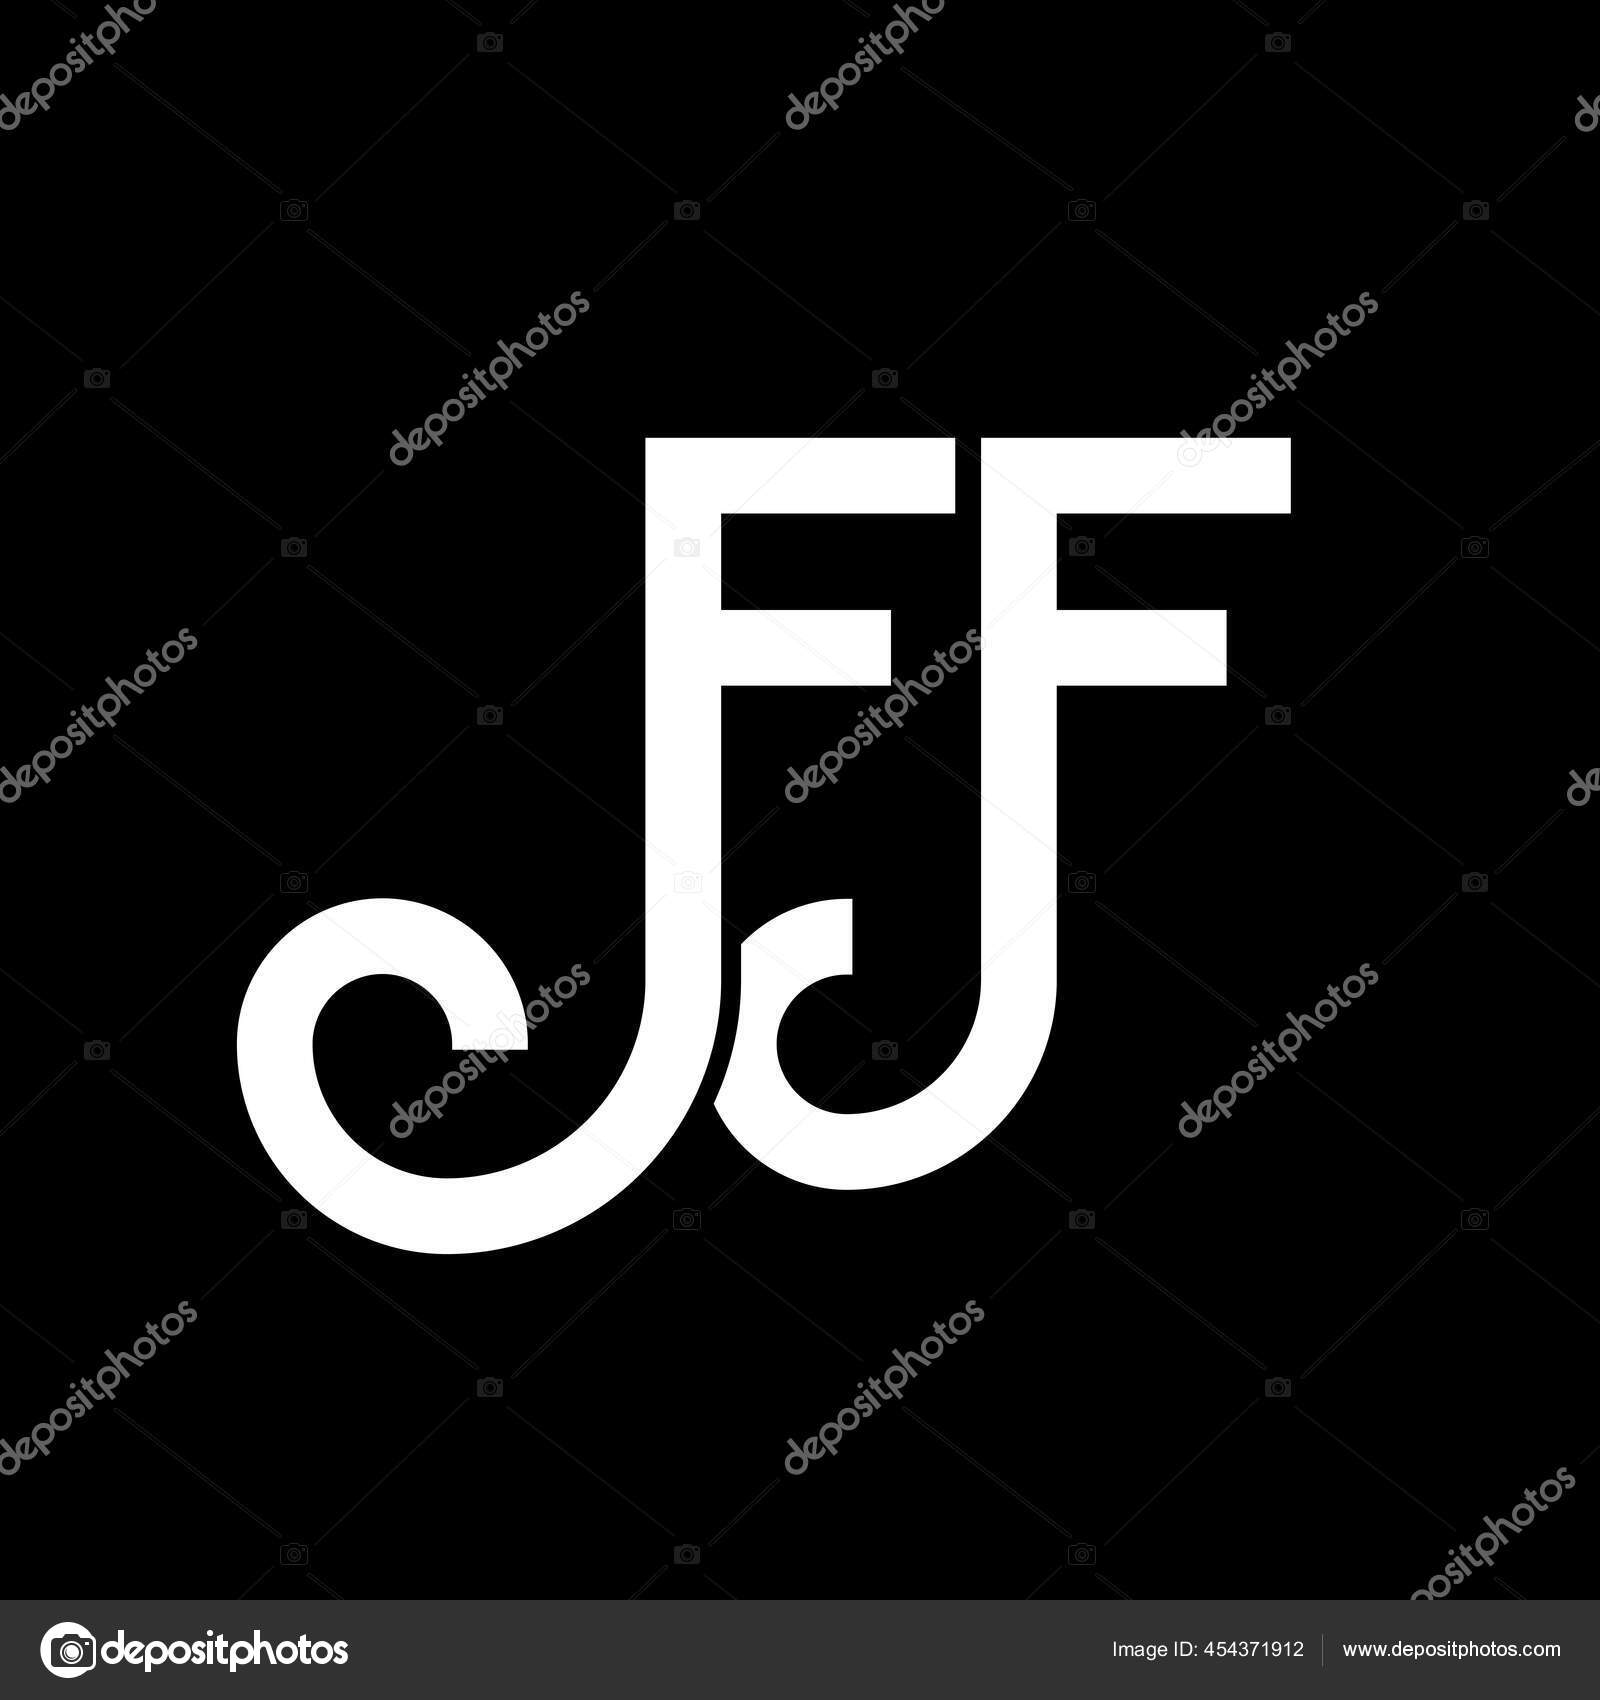 Desain Logo Huruf Pada Latar Belakang Hitam Kreatif Inisial Huruf Stok Vektor C Mamuntwofiveg 454371912